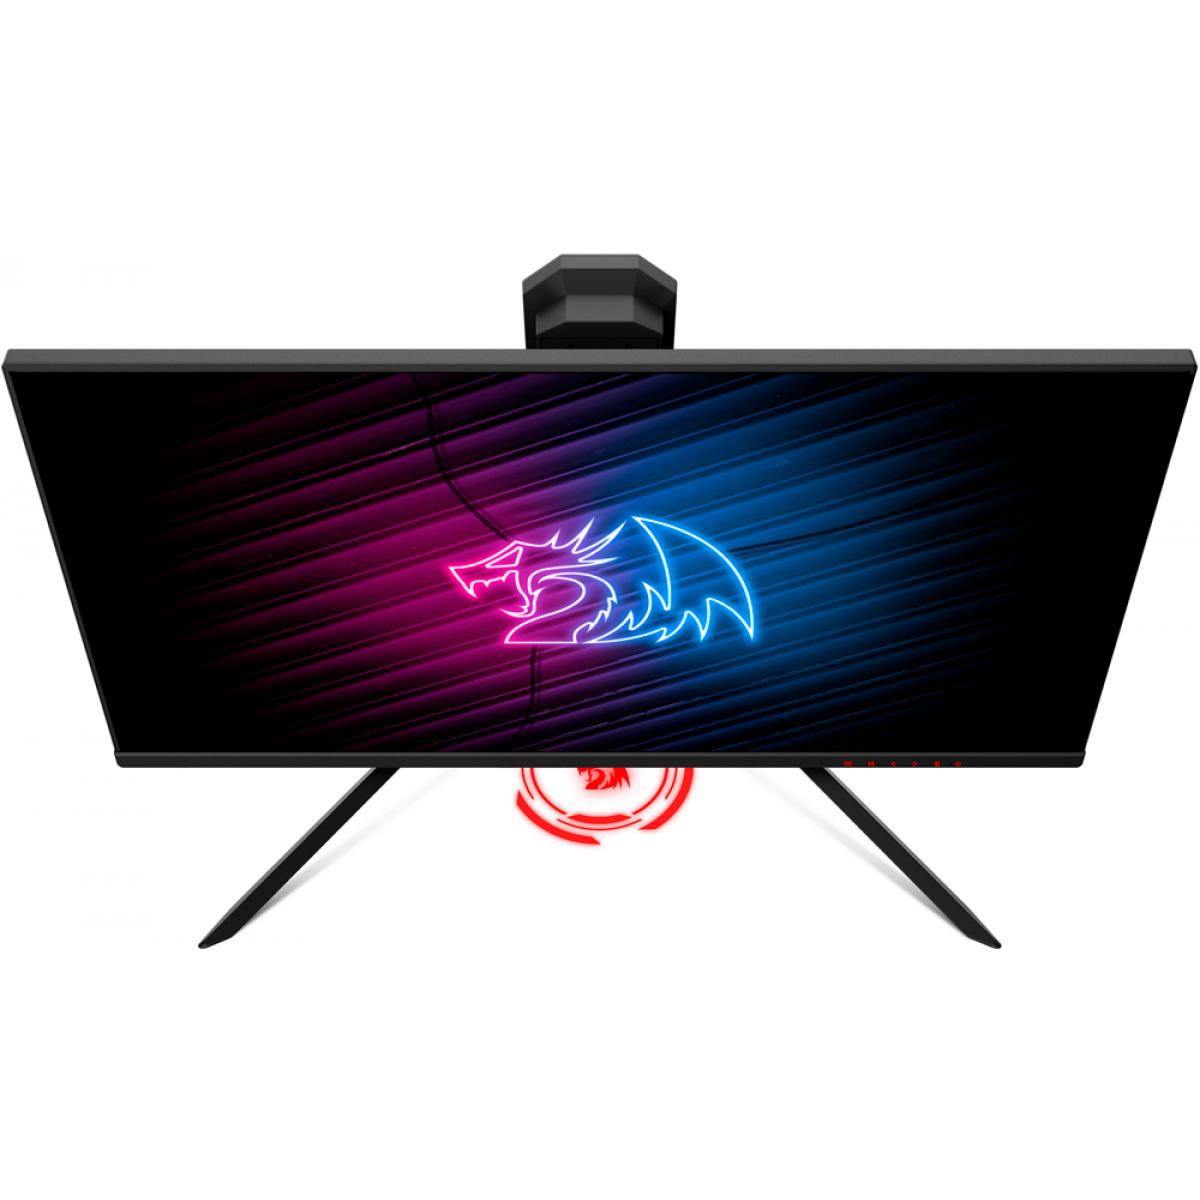 Monitor Gamer Redragon Rediamond RGB, 25 Pol, Full HD, 144Hz, 1ms, HDMI, Display Port